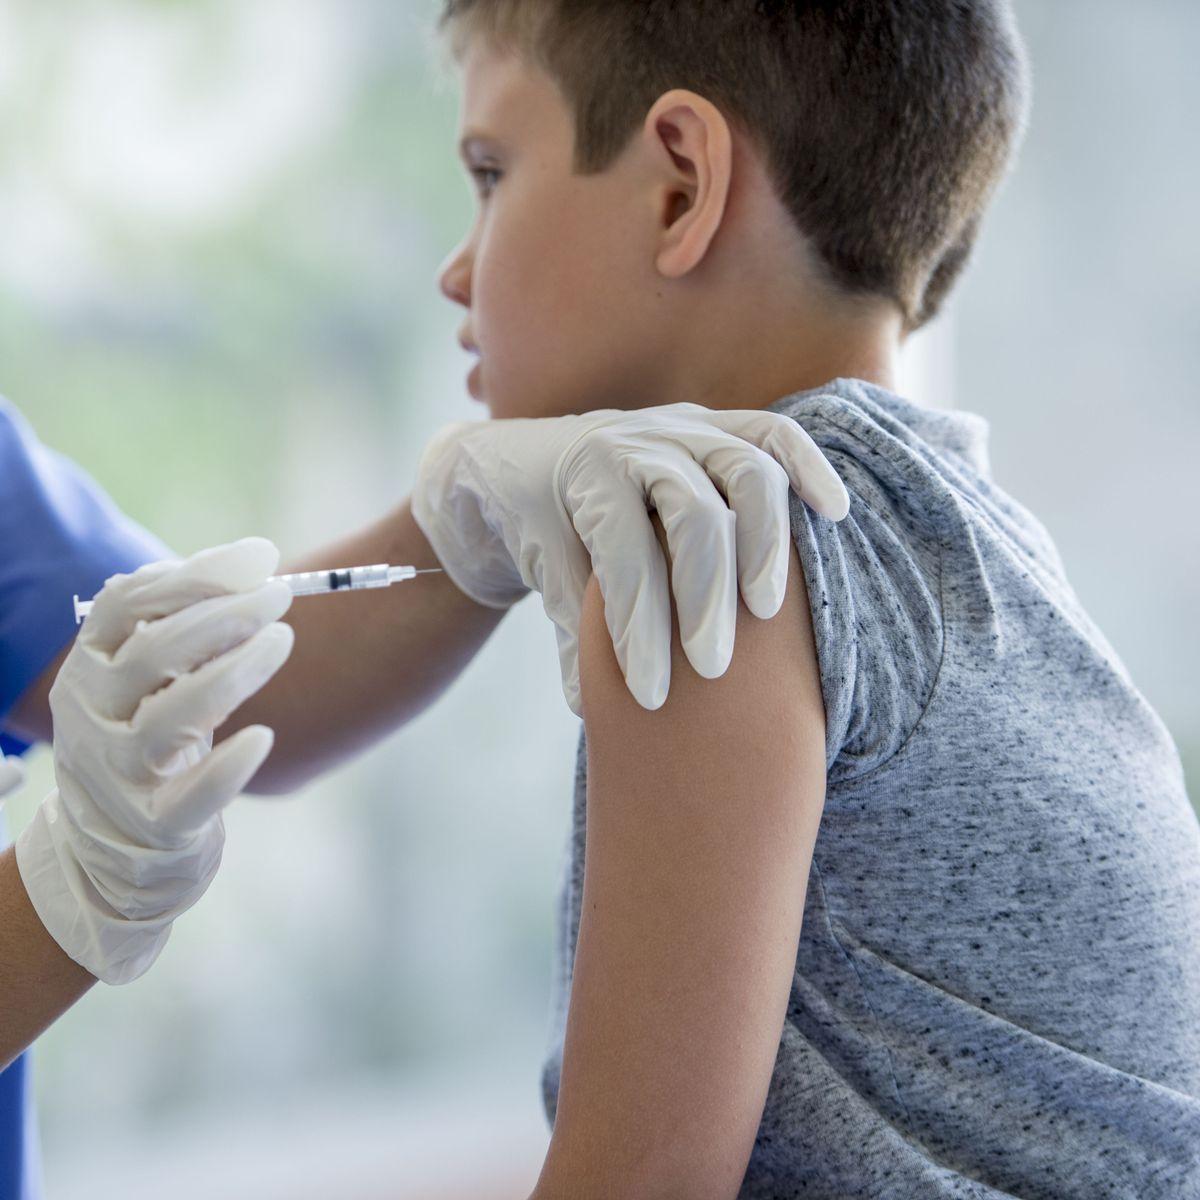 hpv impfung jungen todesfalle